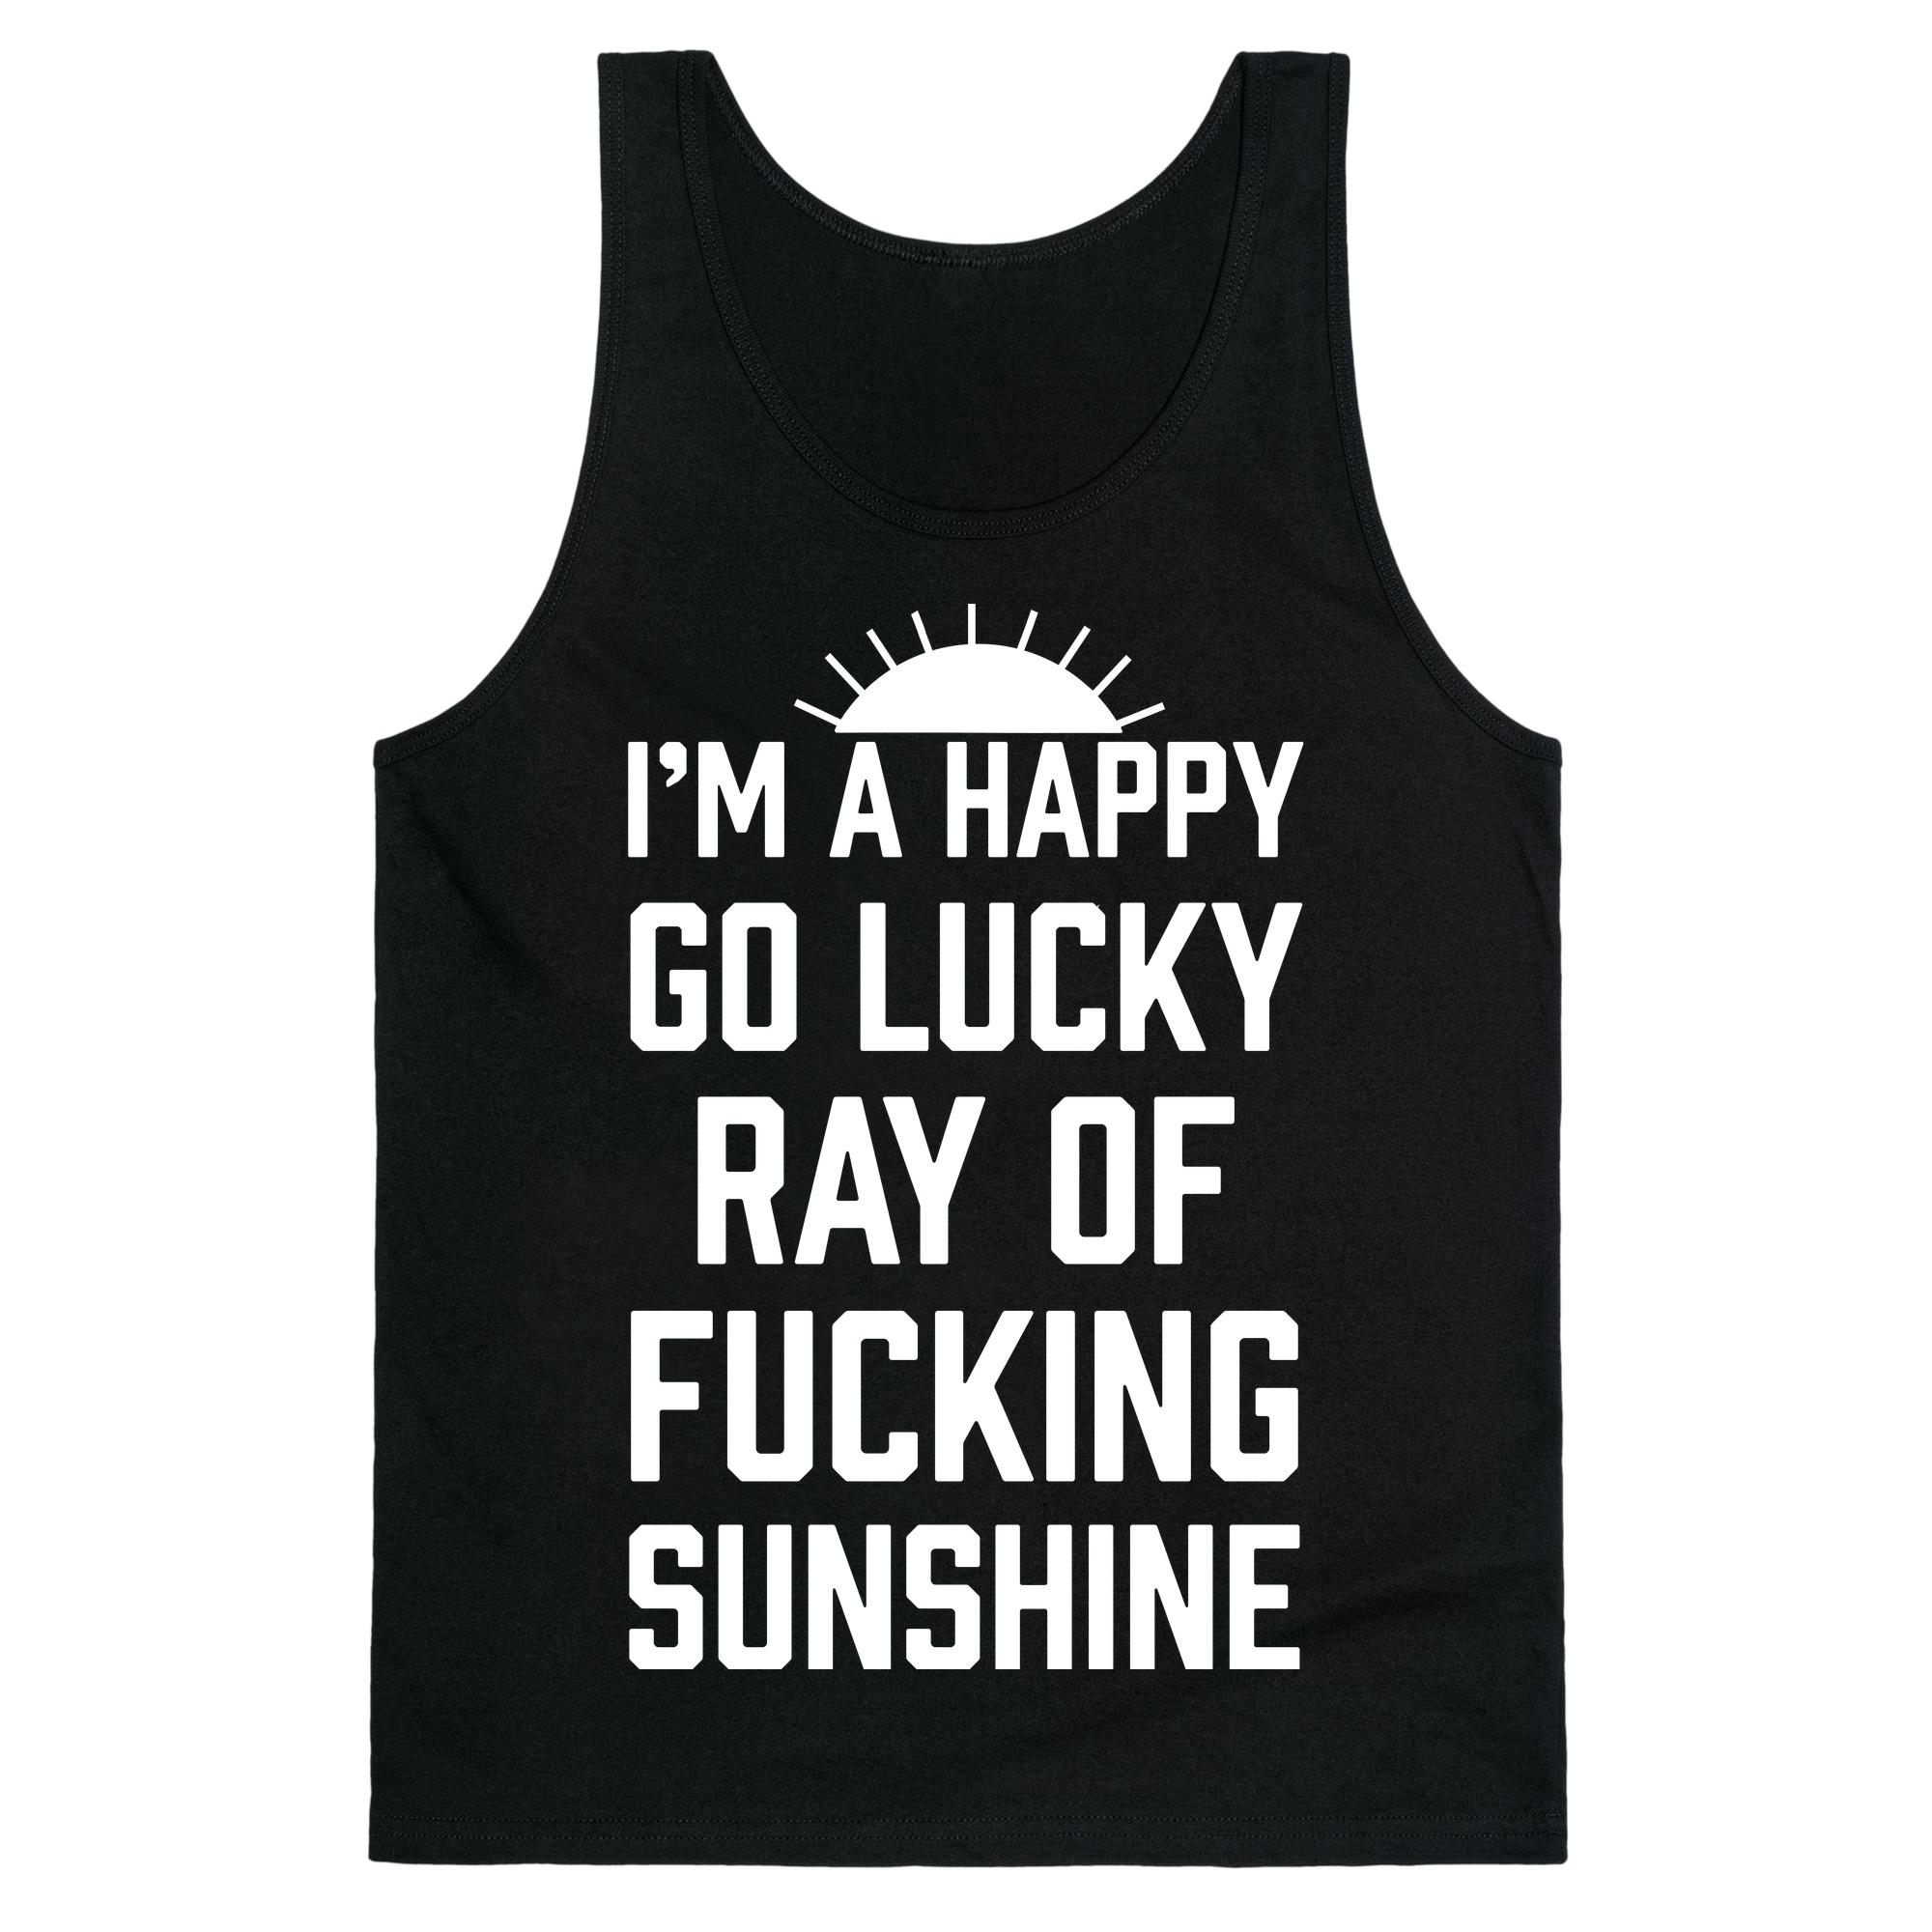 Im a happy go lucky ray of fucking sunshine tank top